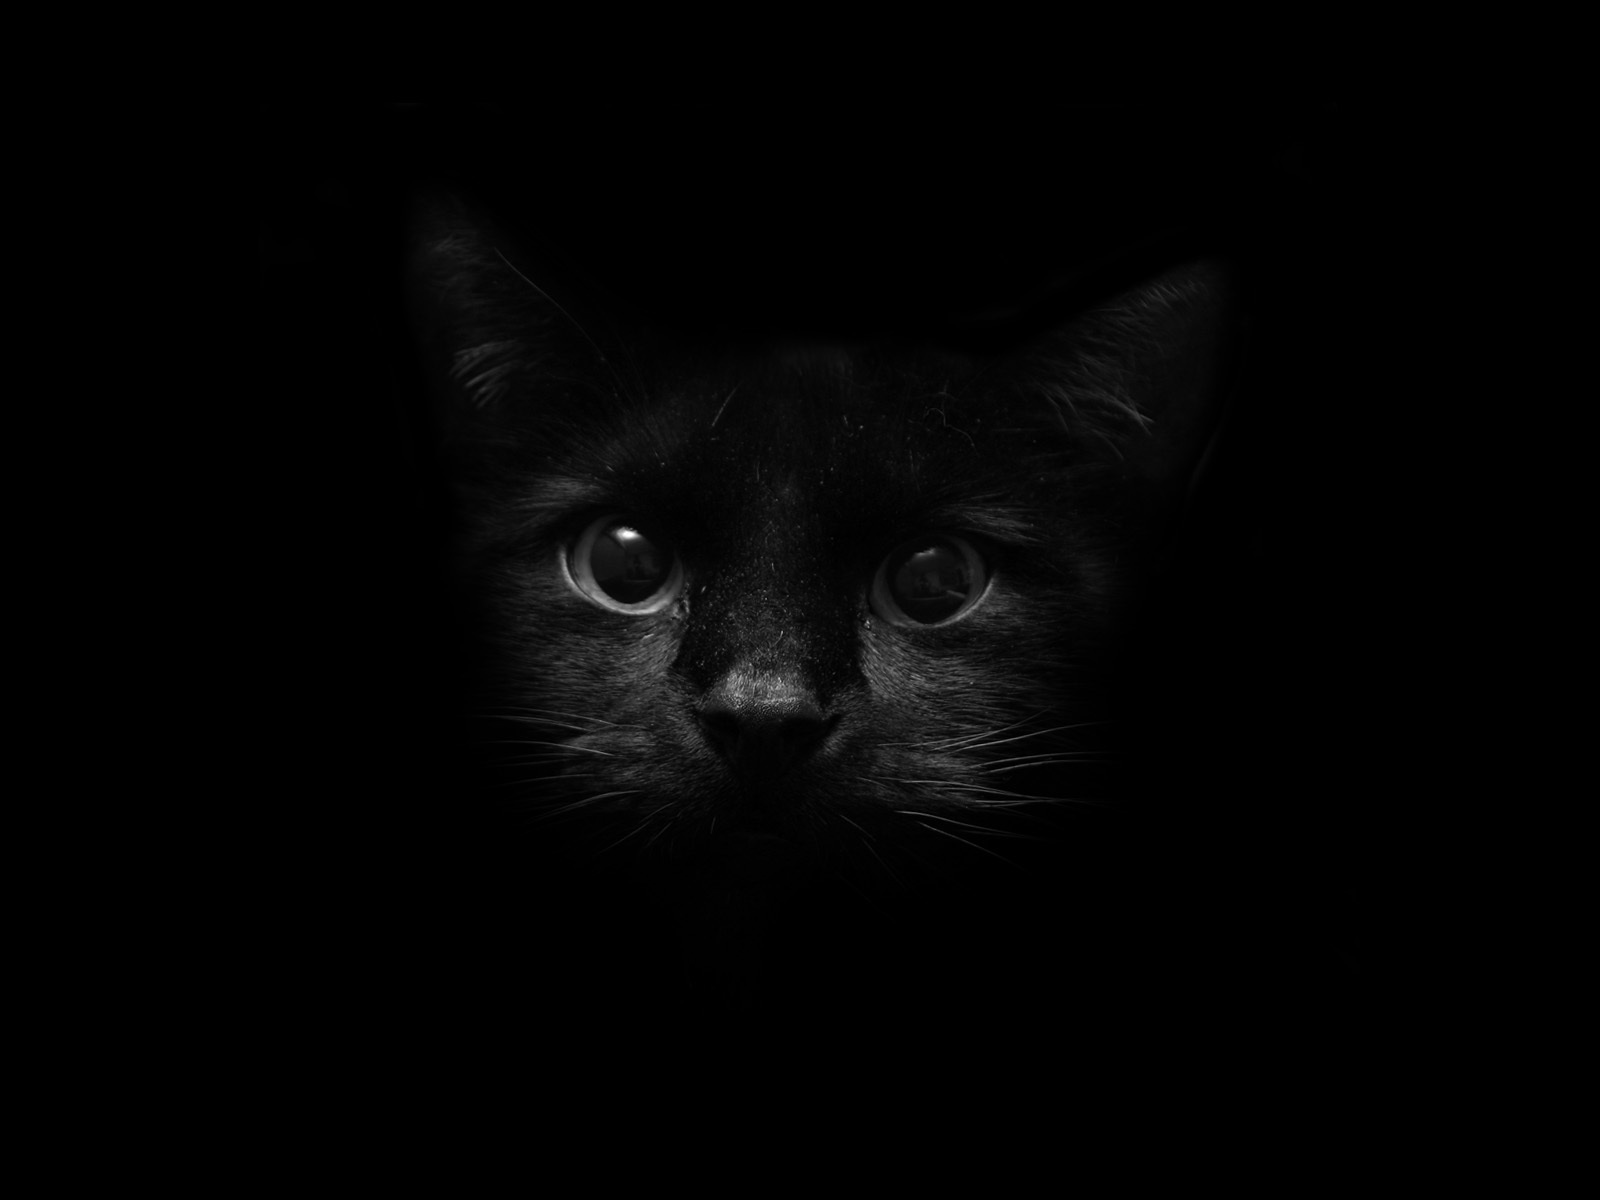 Black Cat 26 Wide Wallpaper